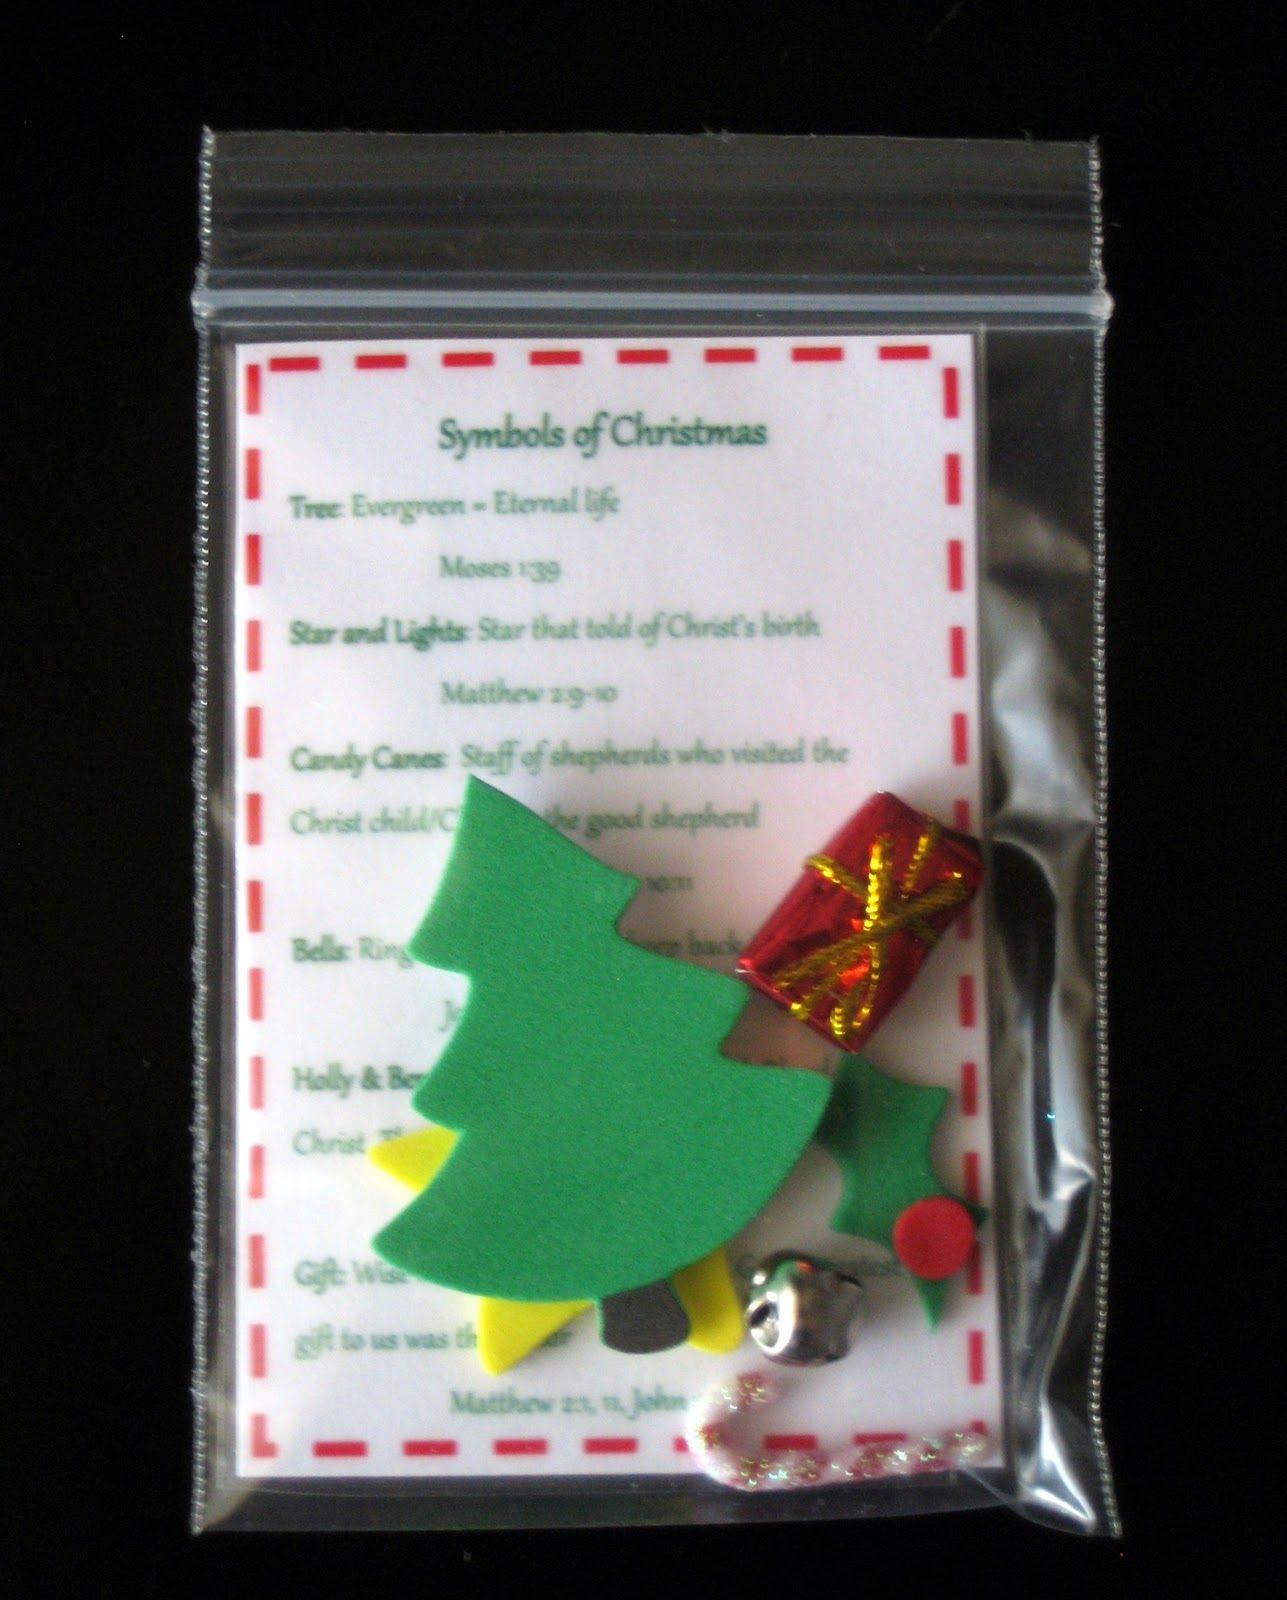 Peppermint plum miniature christmas symbols kit love missions peppermint plum miniature christmas symbols kit biocorpaavc Image collections